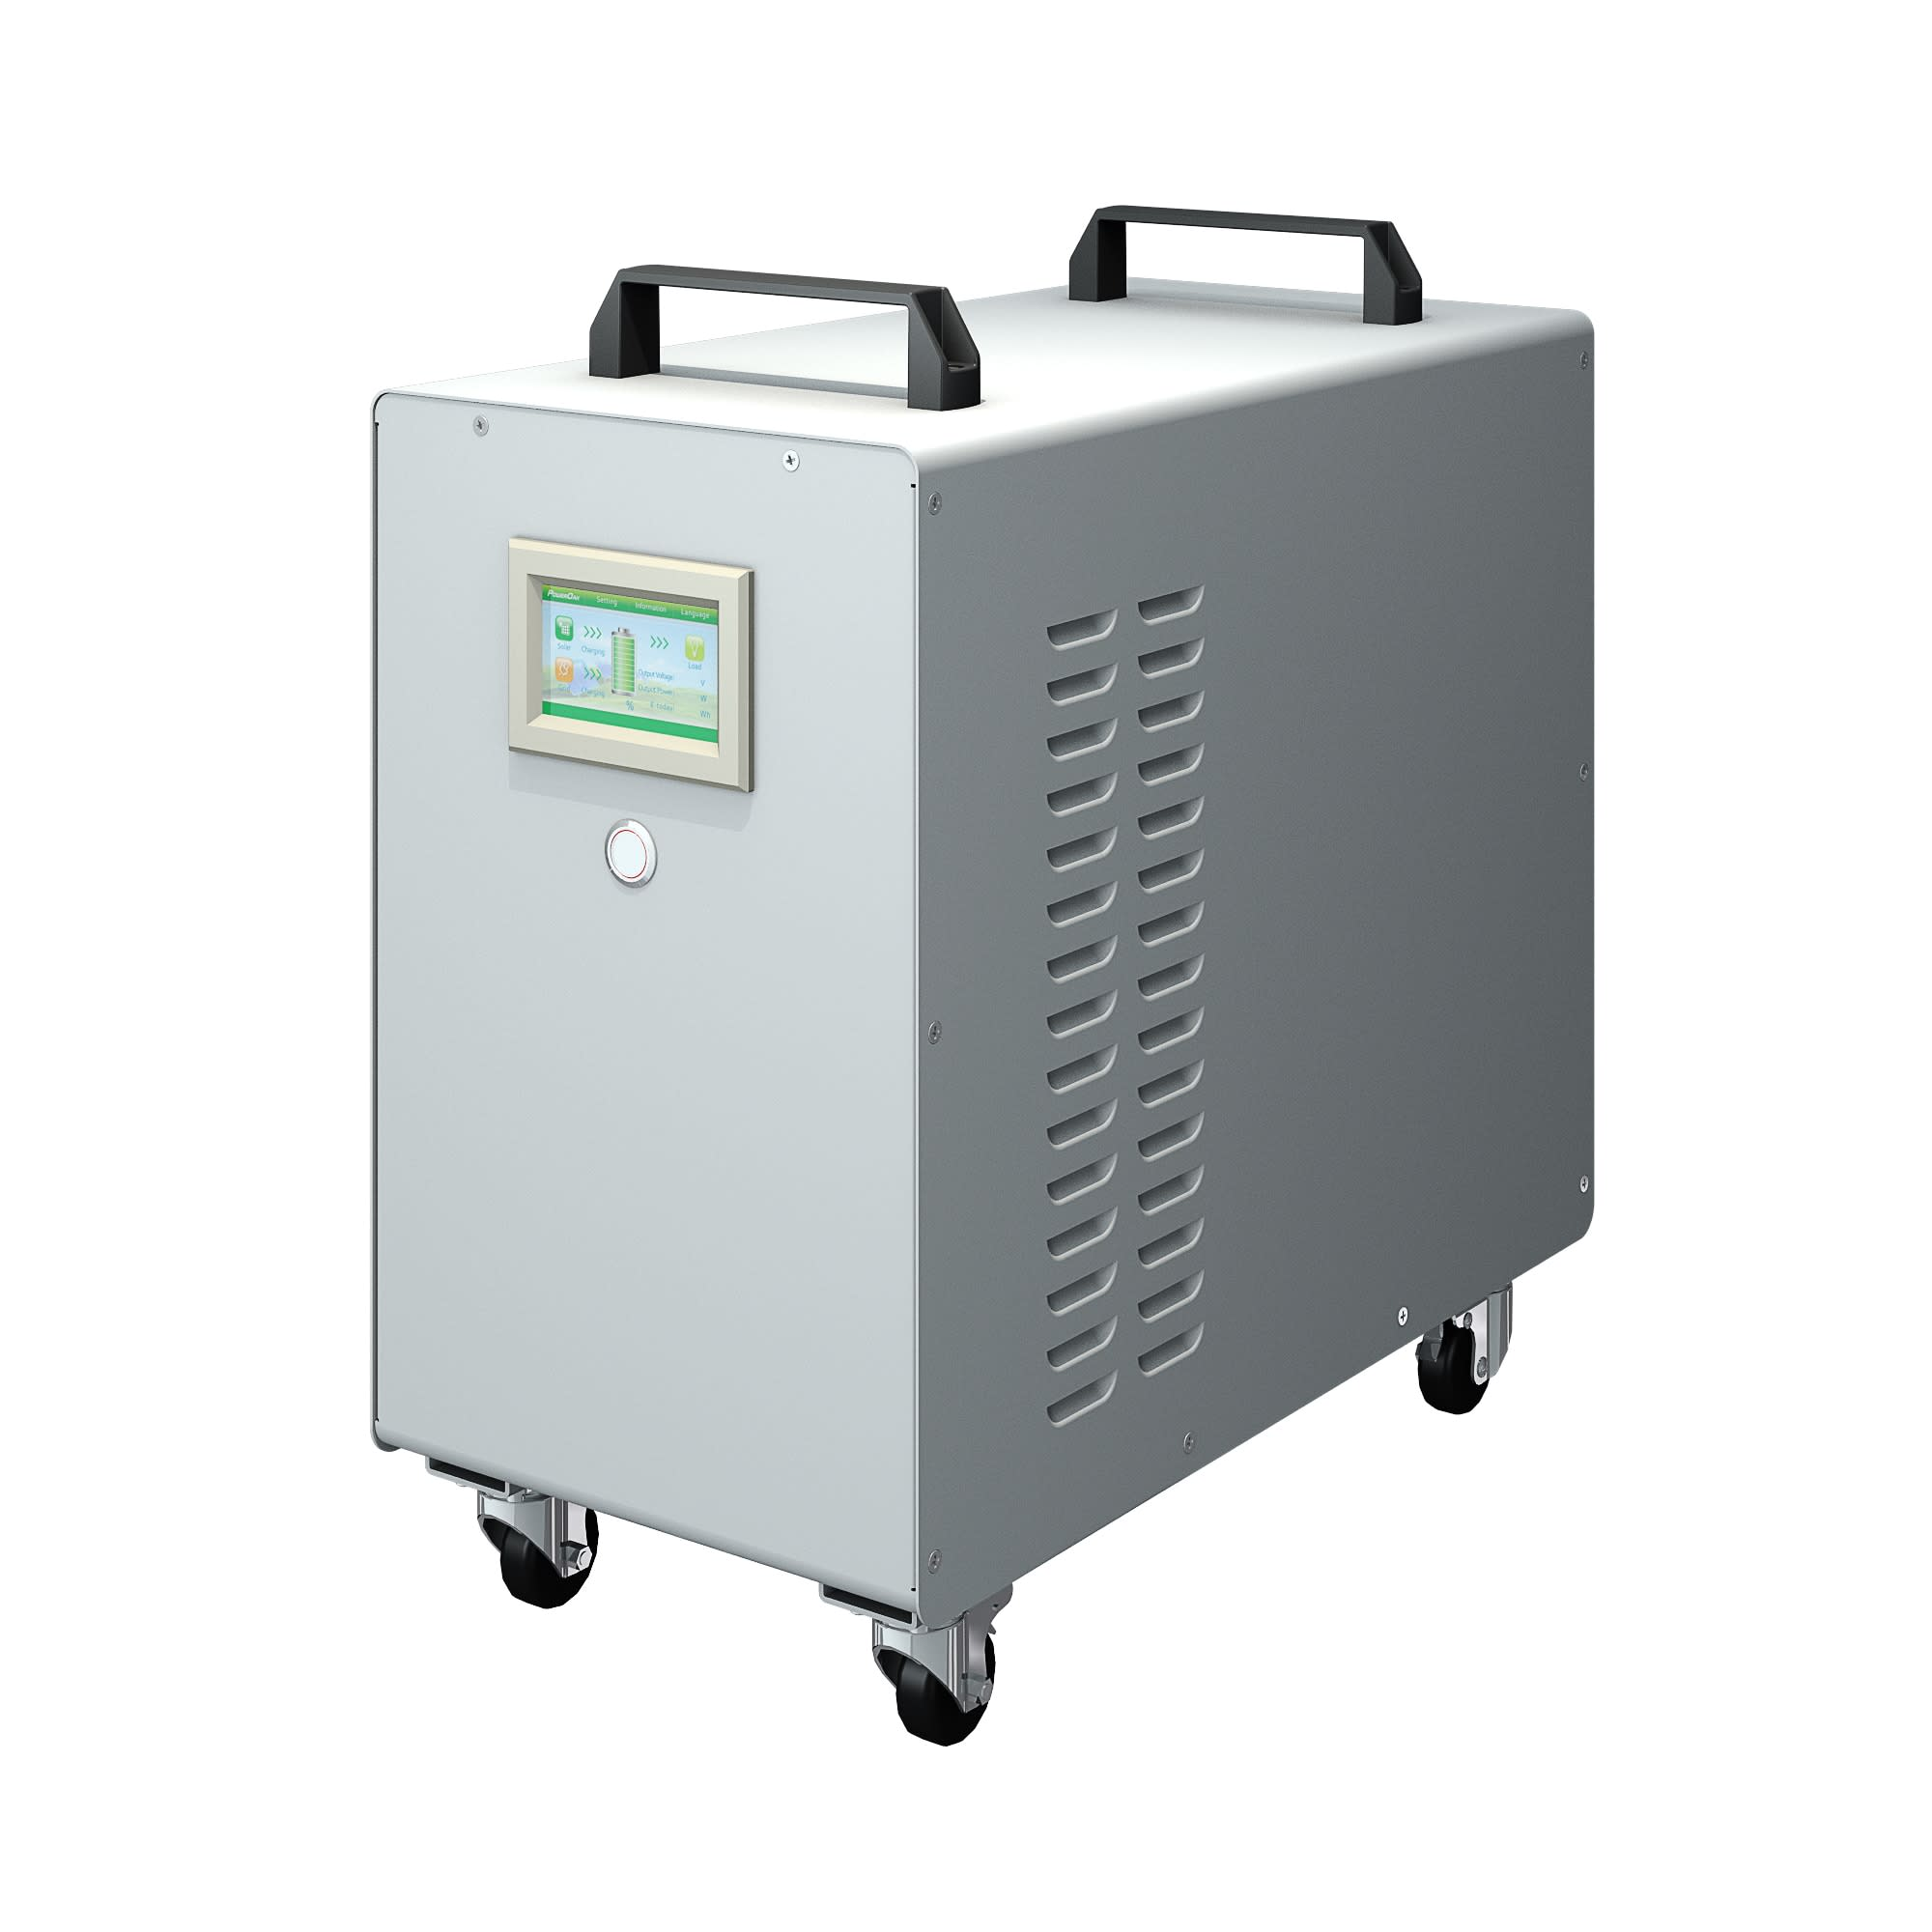 SolarPower Sistema Generador Solar Integrado para Hogares